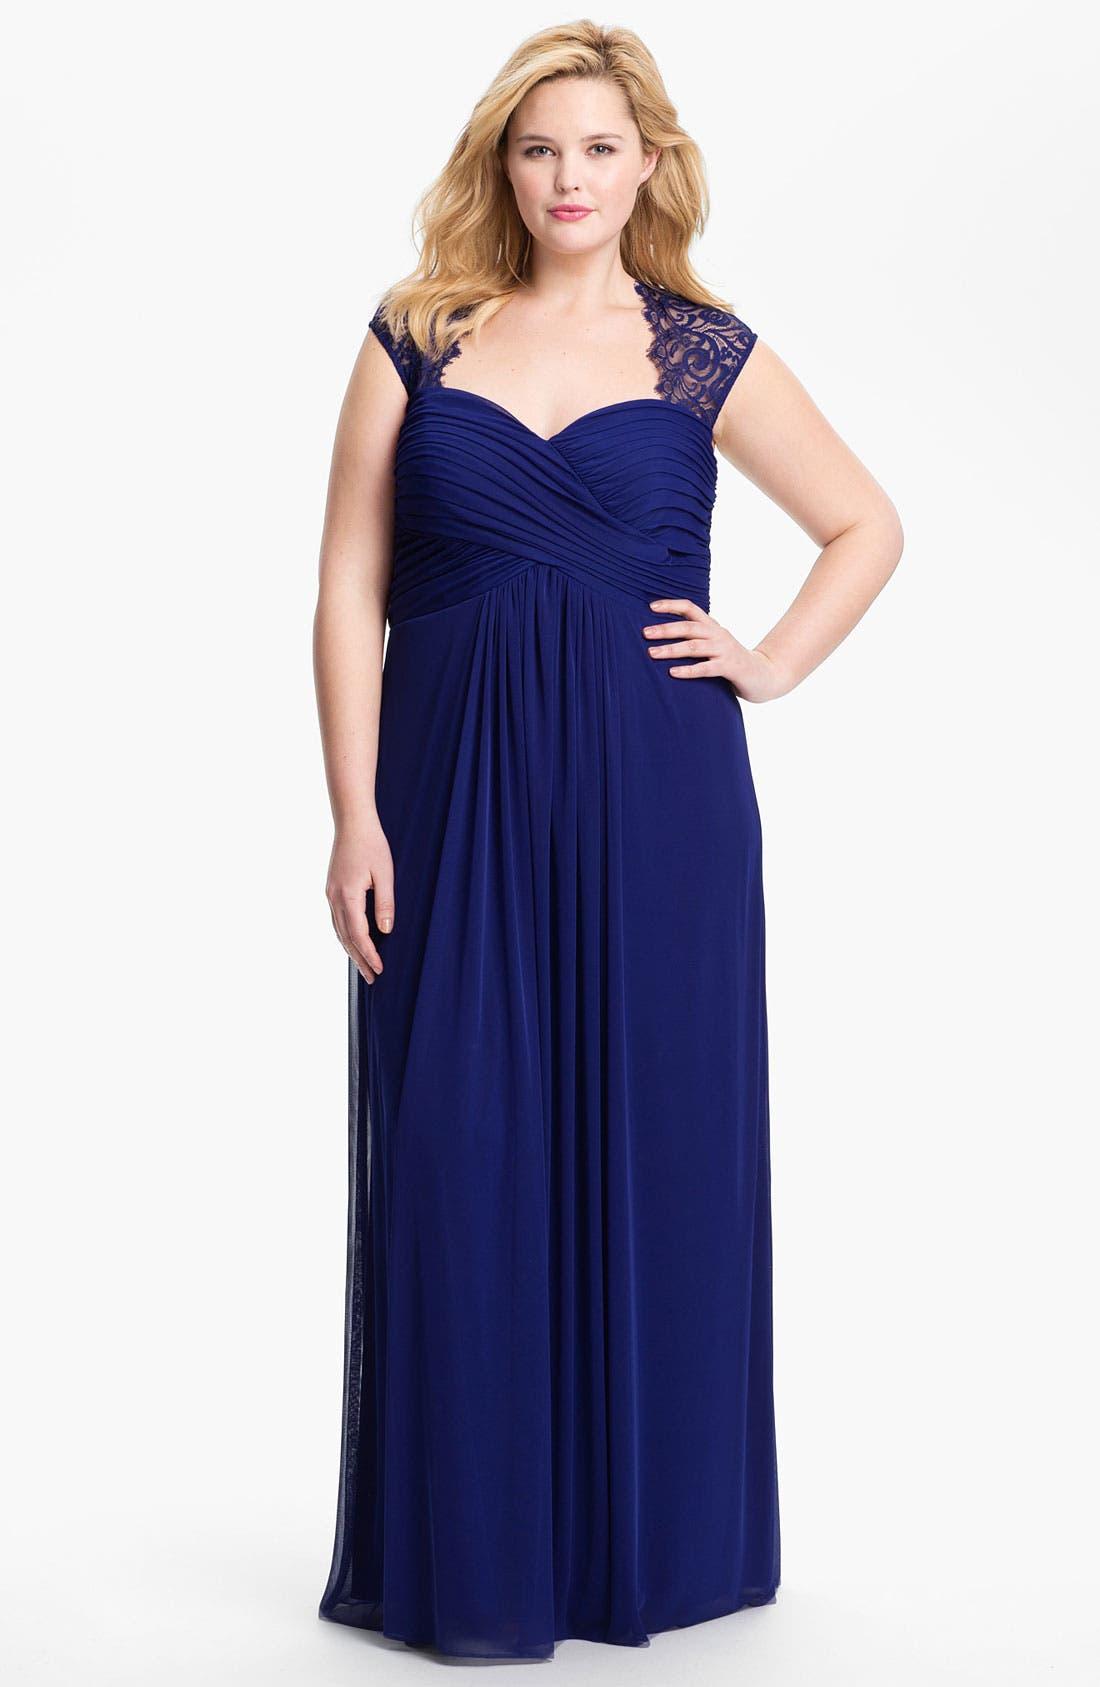 Alternate Image 1 Selected - Xscape Lace Cap Sleeve Mesh Gown (Plus)